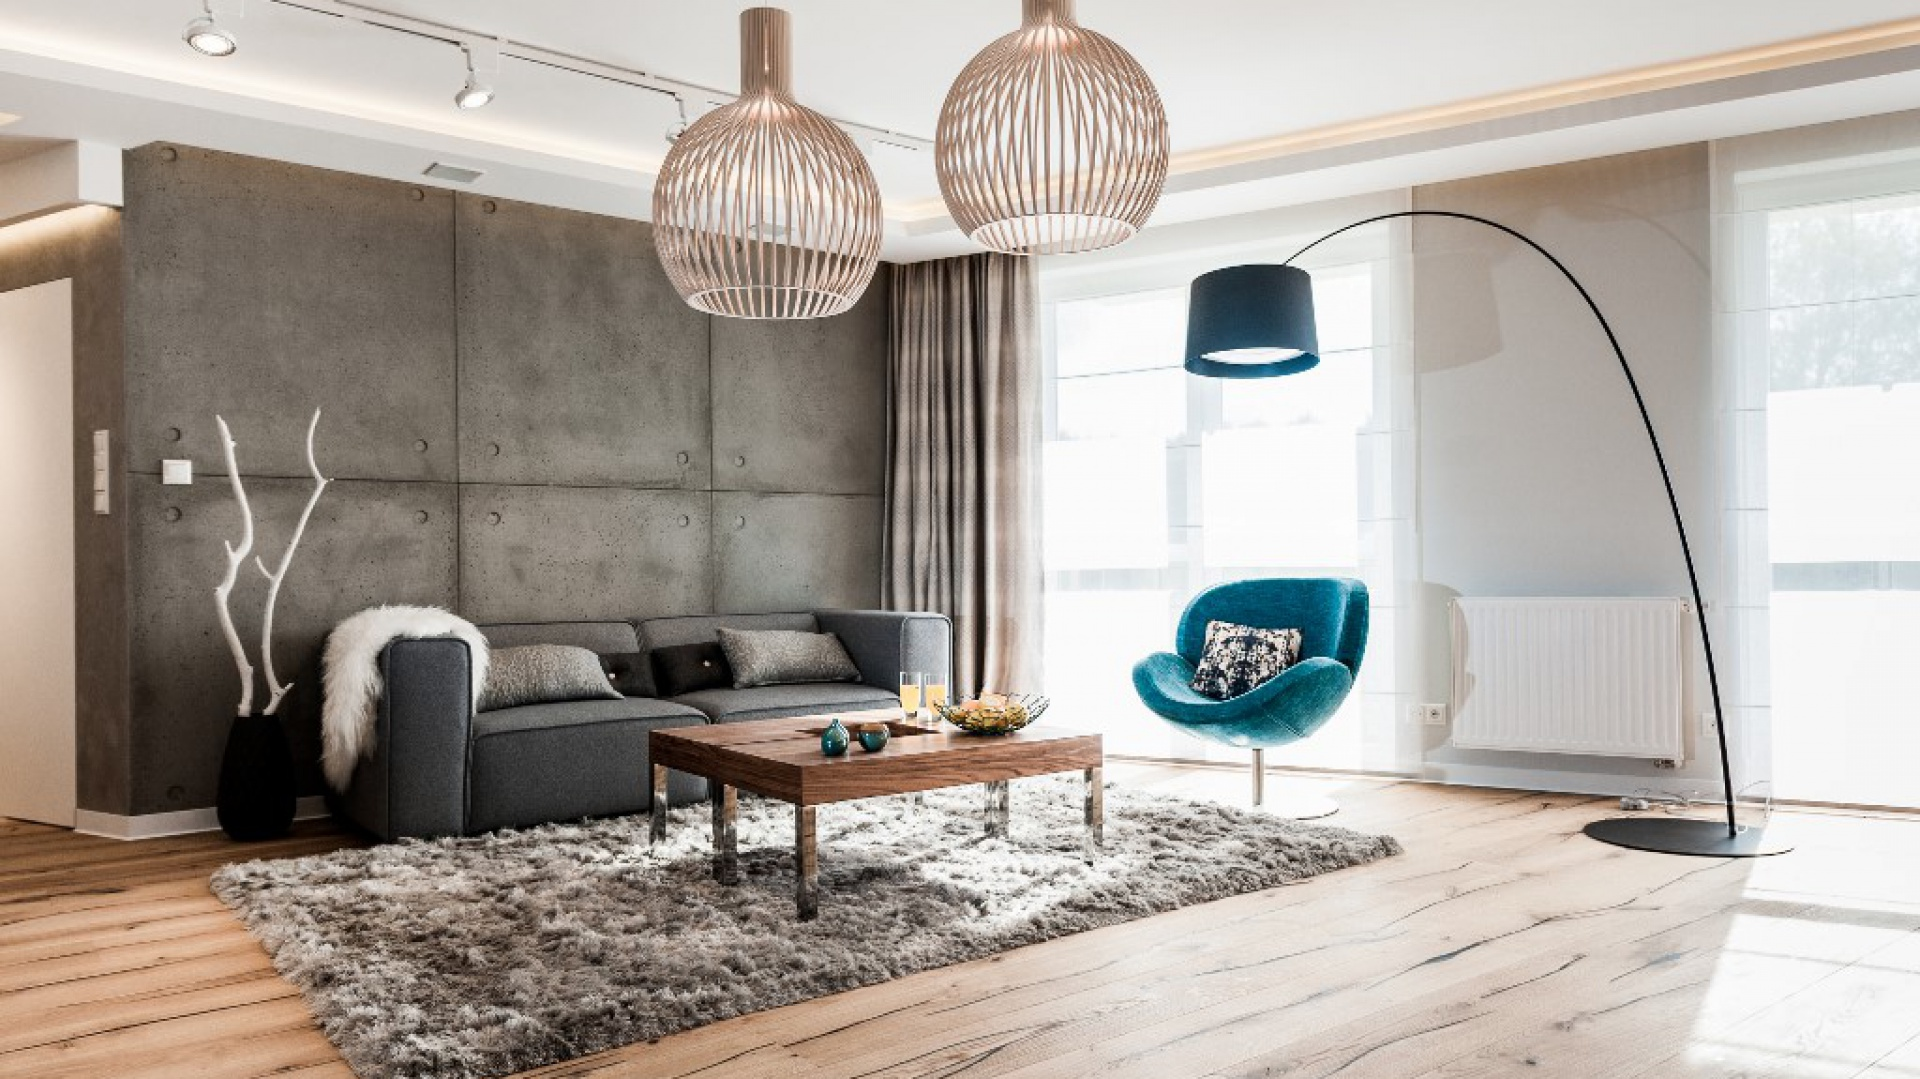 Piękne mieszkanie w Gdańsku, projekt Arte Dizain